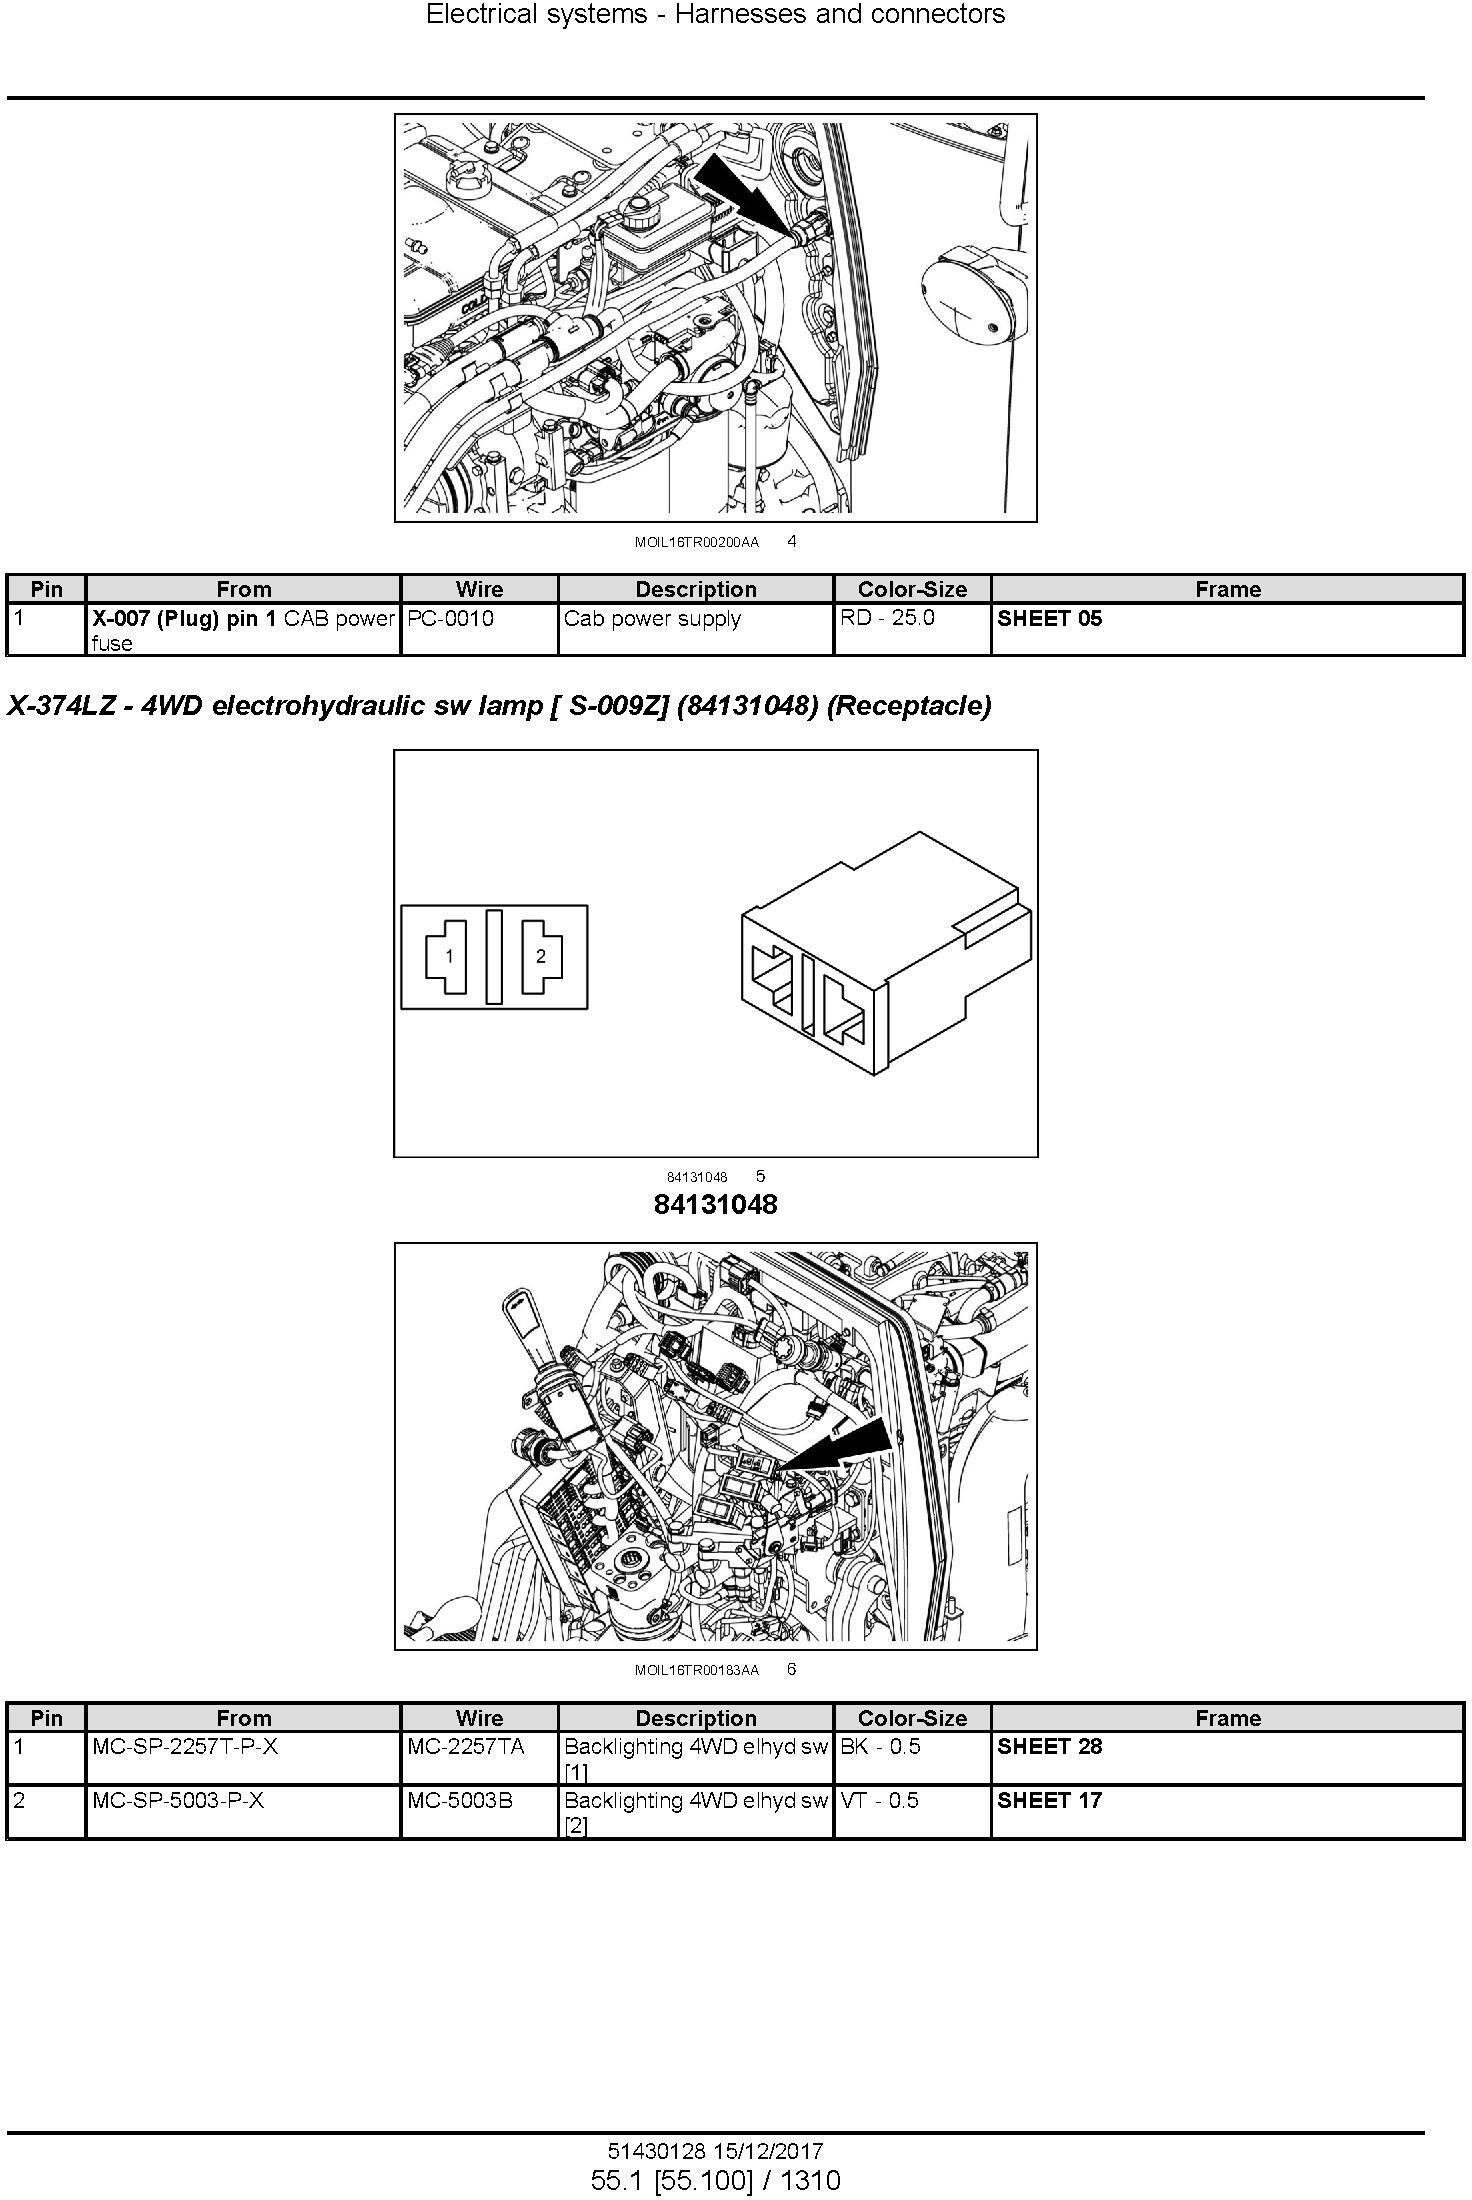 New Holland T4.80F, T4.80V, T4.90F, T4.90V, T4.100F, T4.100V, T4.110F,T4.110V Tractor Service Manual - 3